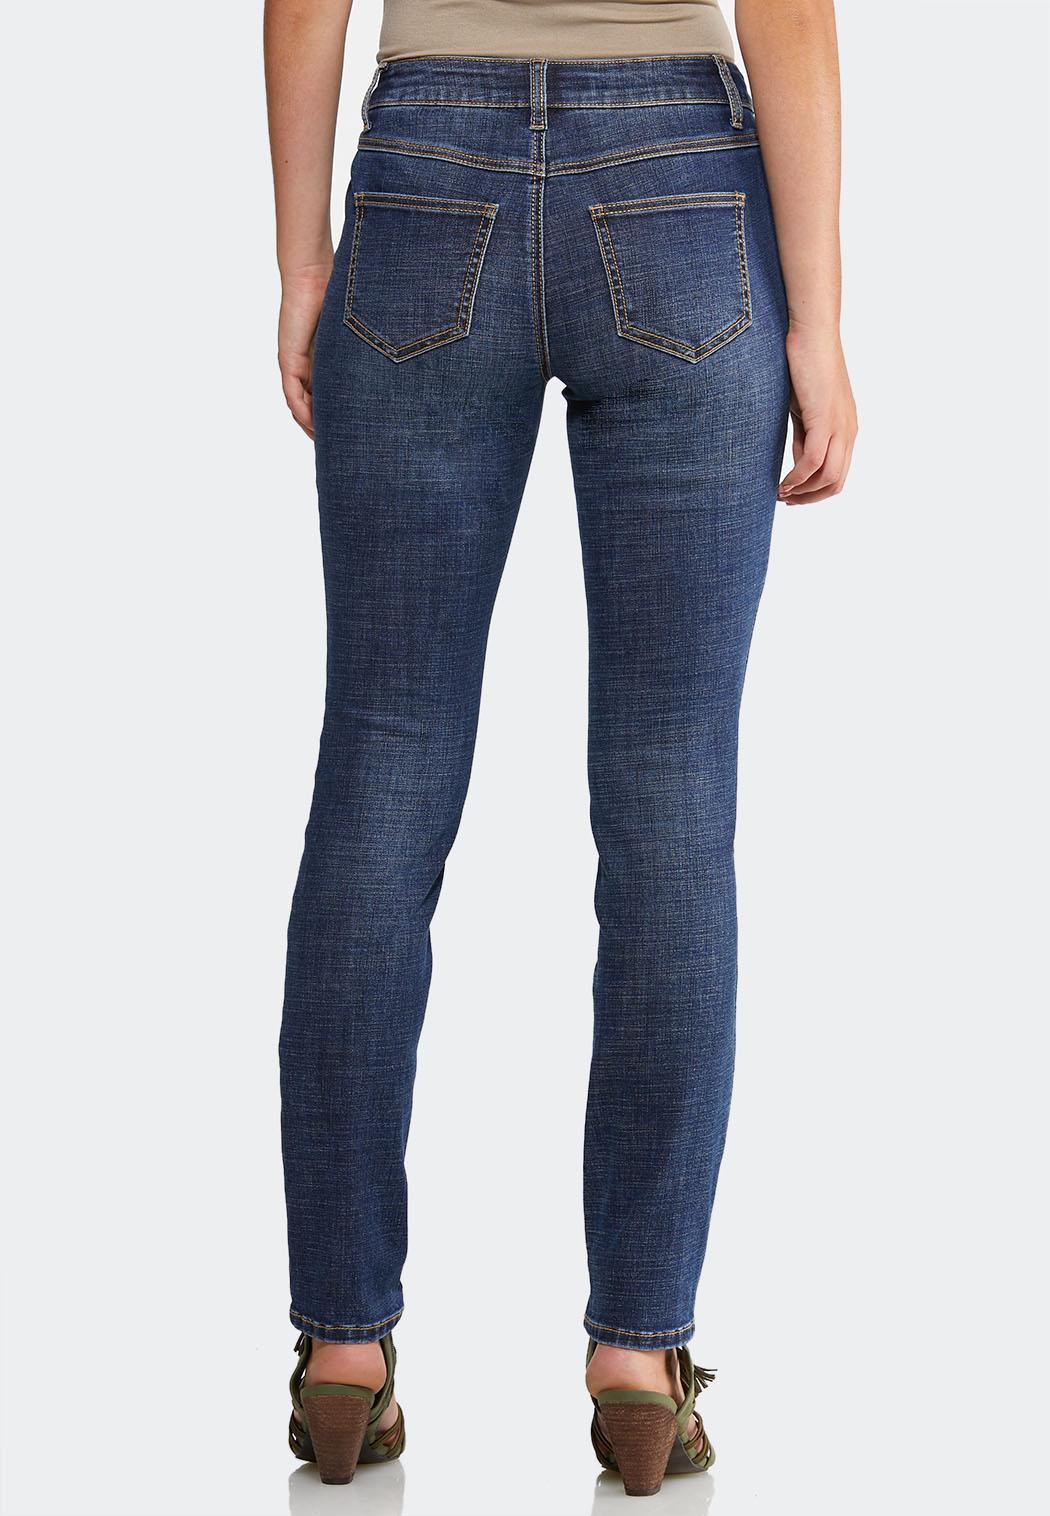 Crosshatch Jeans (Item #43926070)